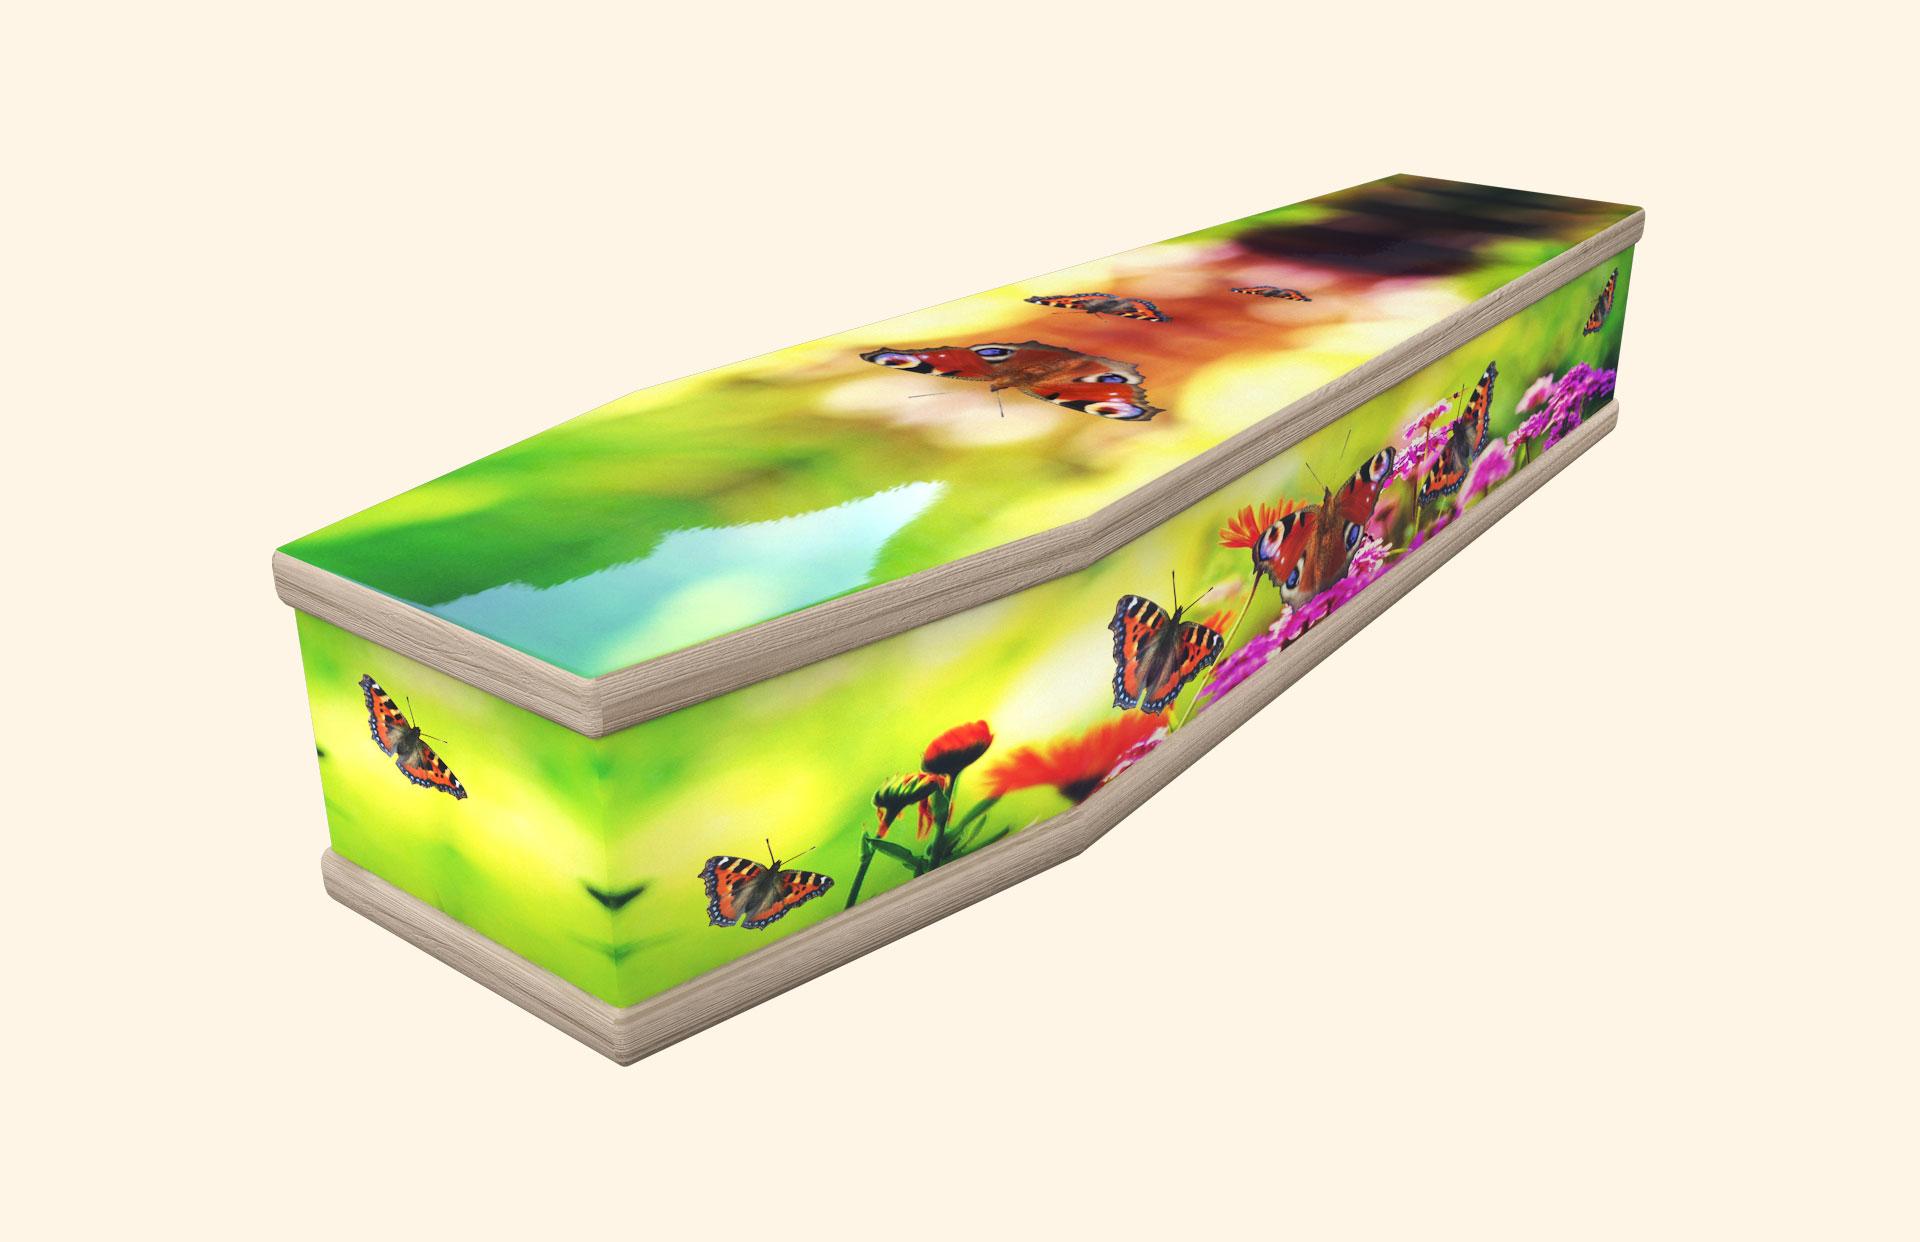 Dancing Butterflies in a classic coffin